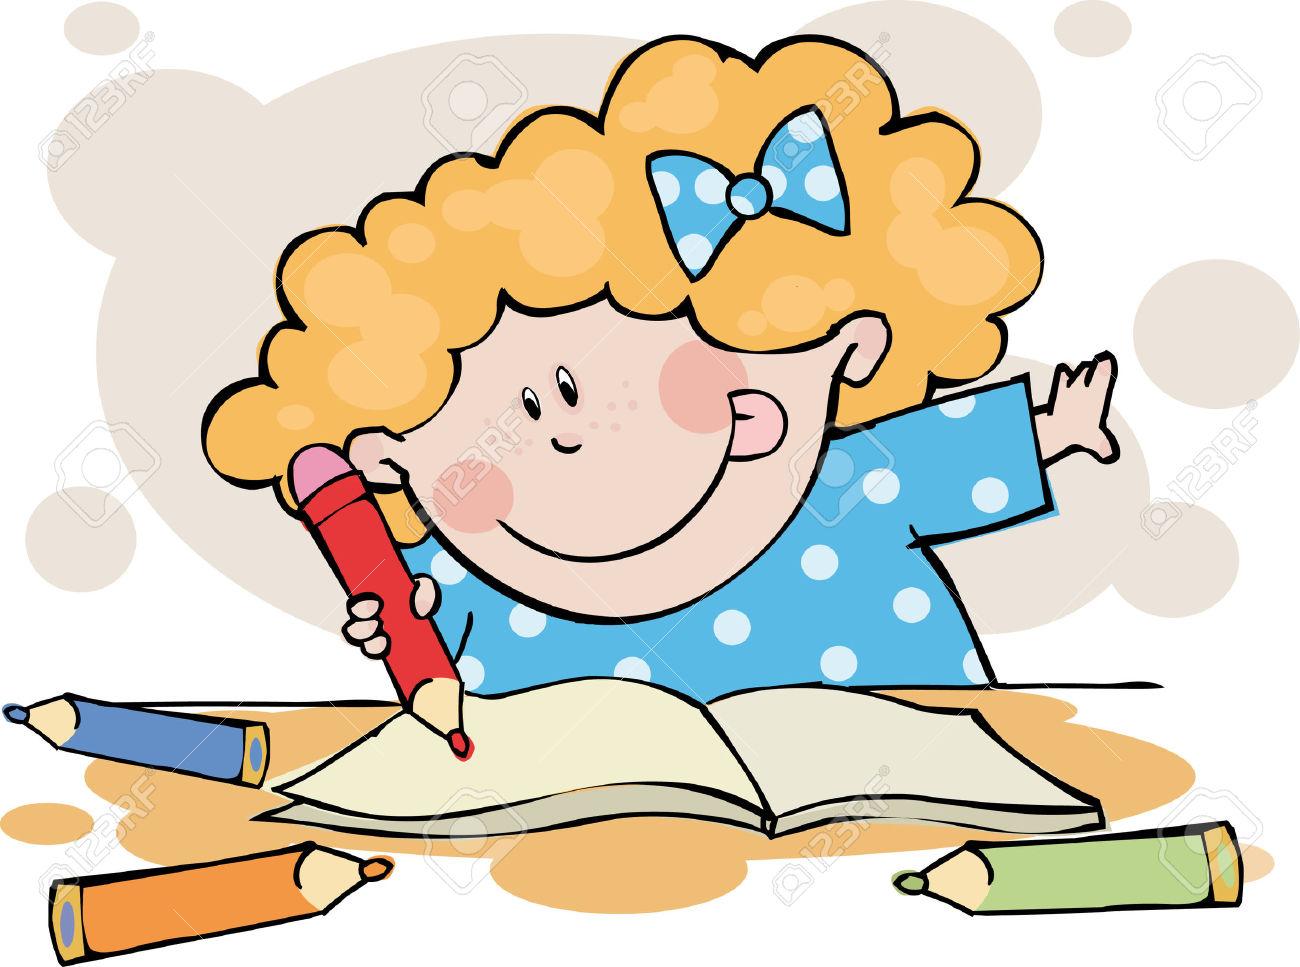 child doing homework clipart - Clipground